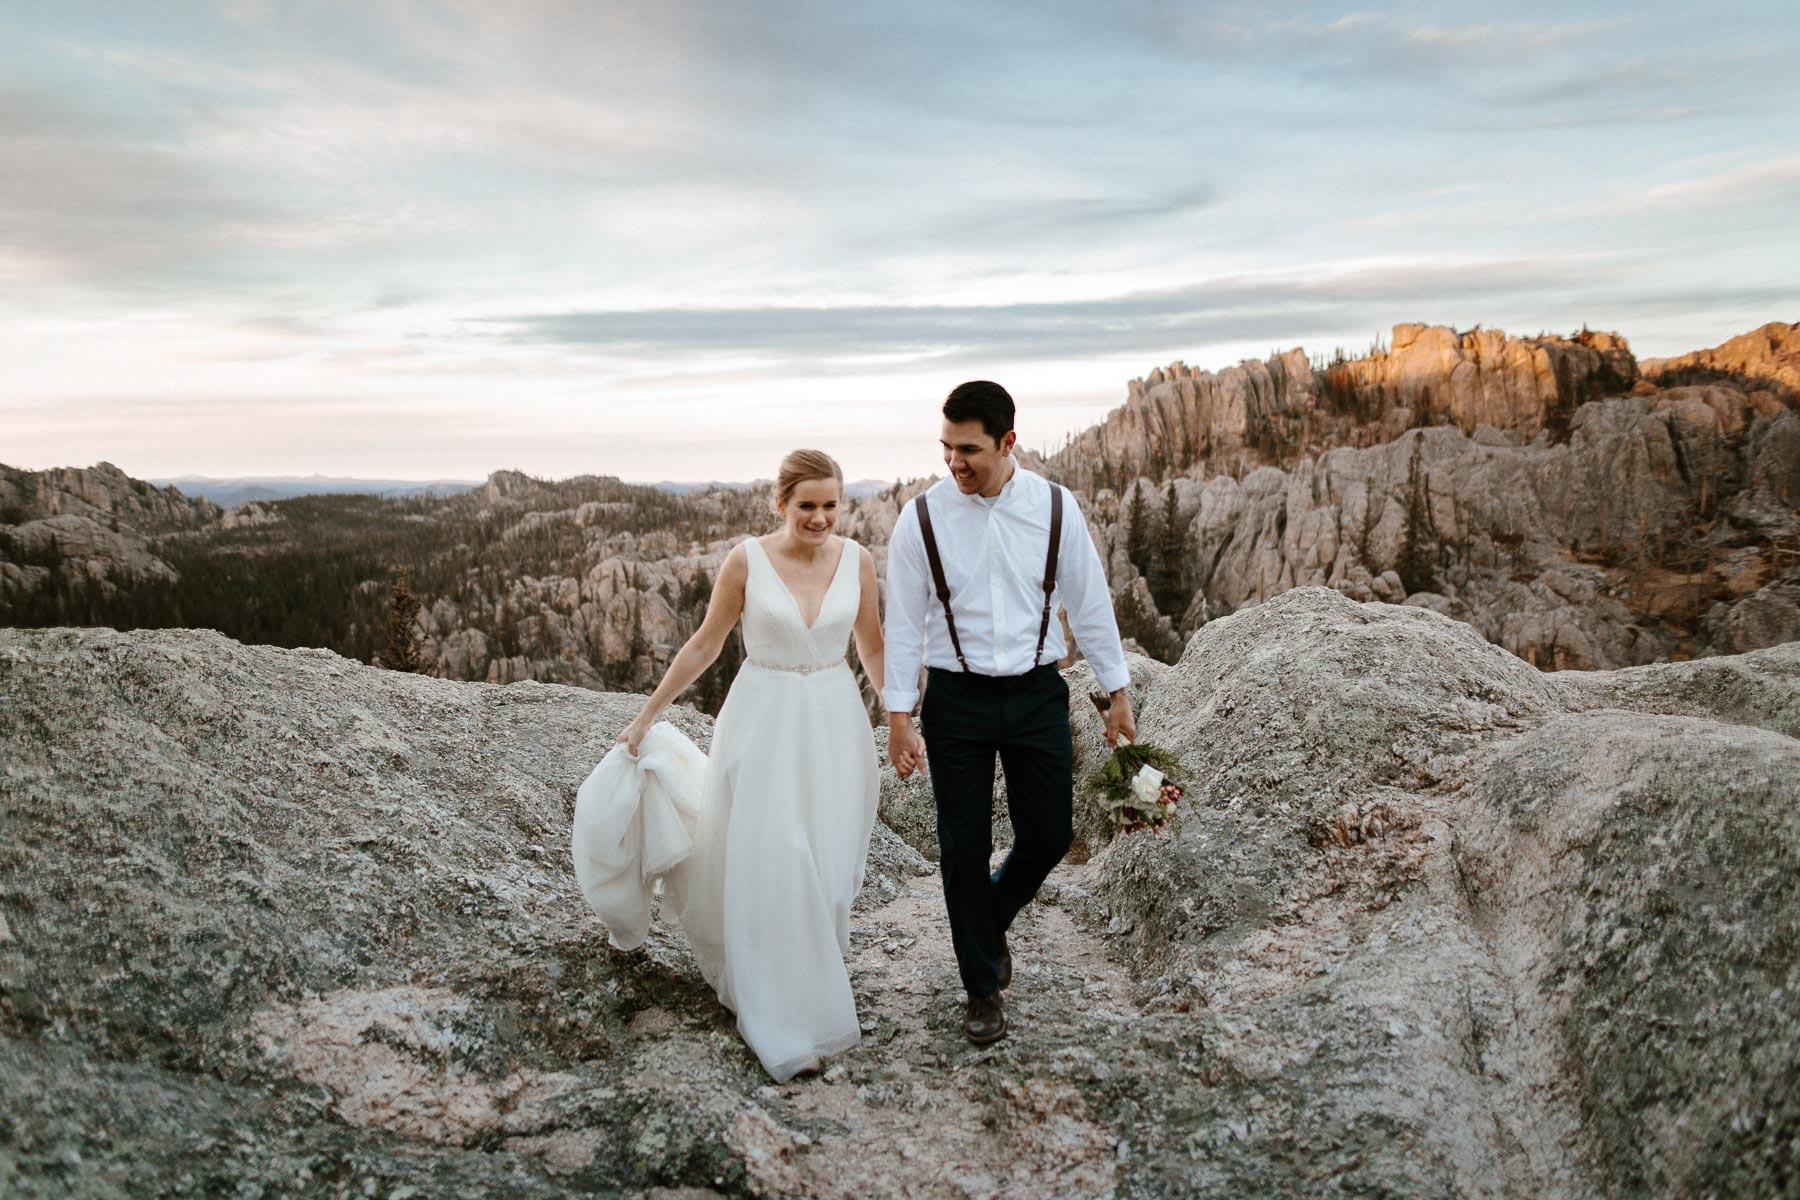 sioux-falls-black-hills-rapid-city-elopement-wedding-adventure-photographer-custer-sylvan-lake-60.jpg